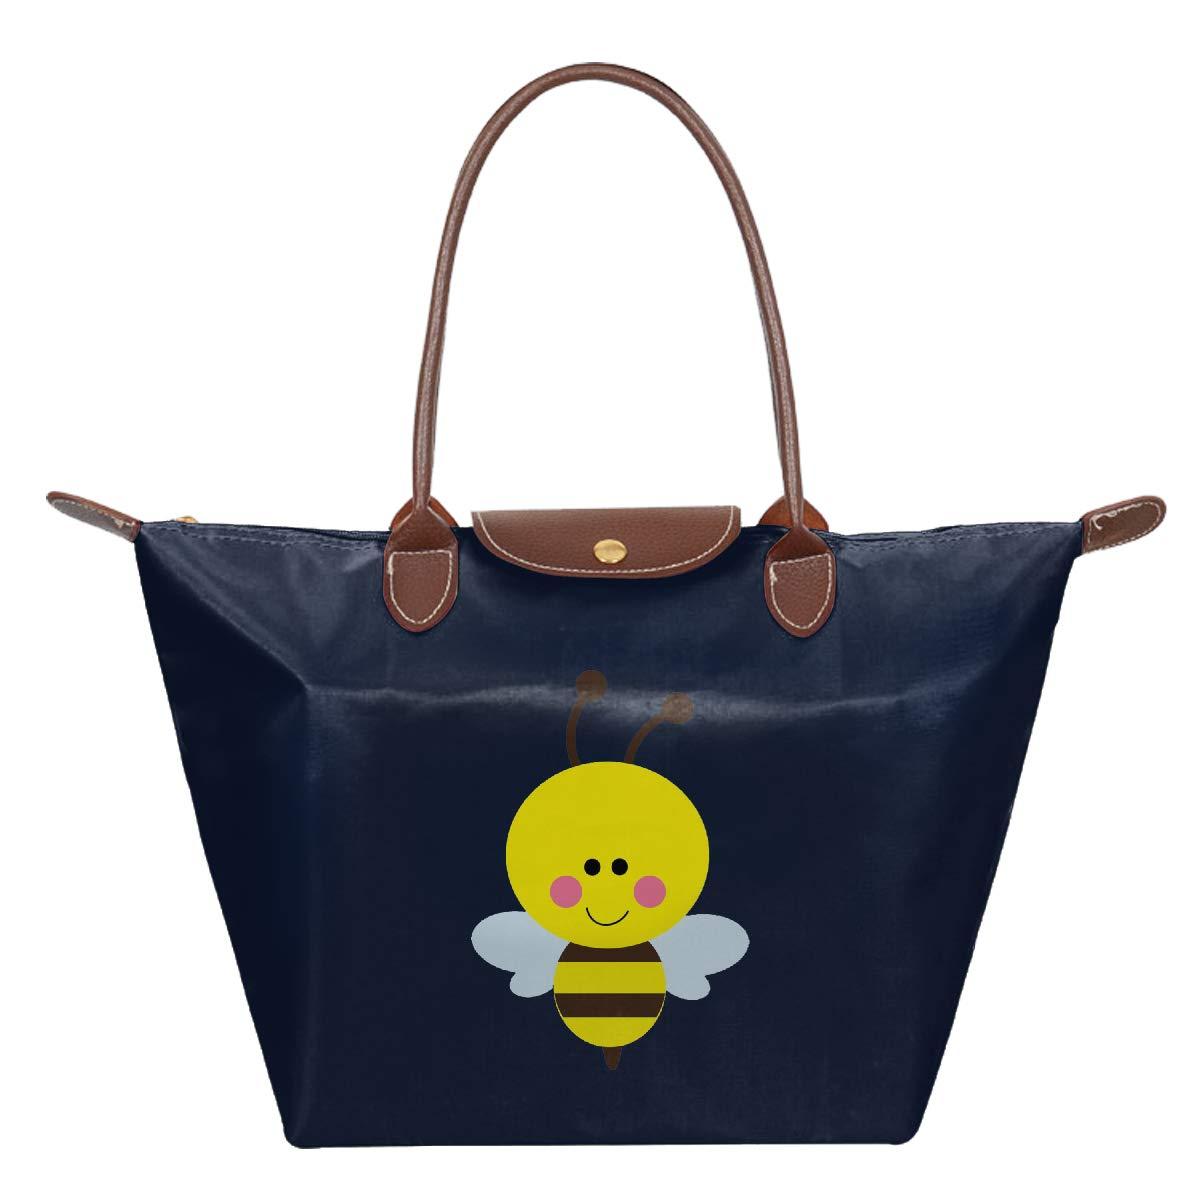 Bumble Bee Waterproof Leather Folded Messenger Nylon Bag Travel Tote Hopping Folding School Handbags